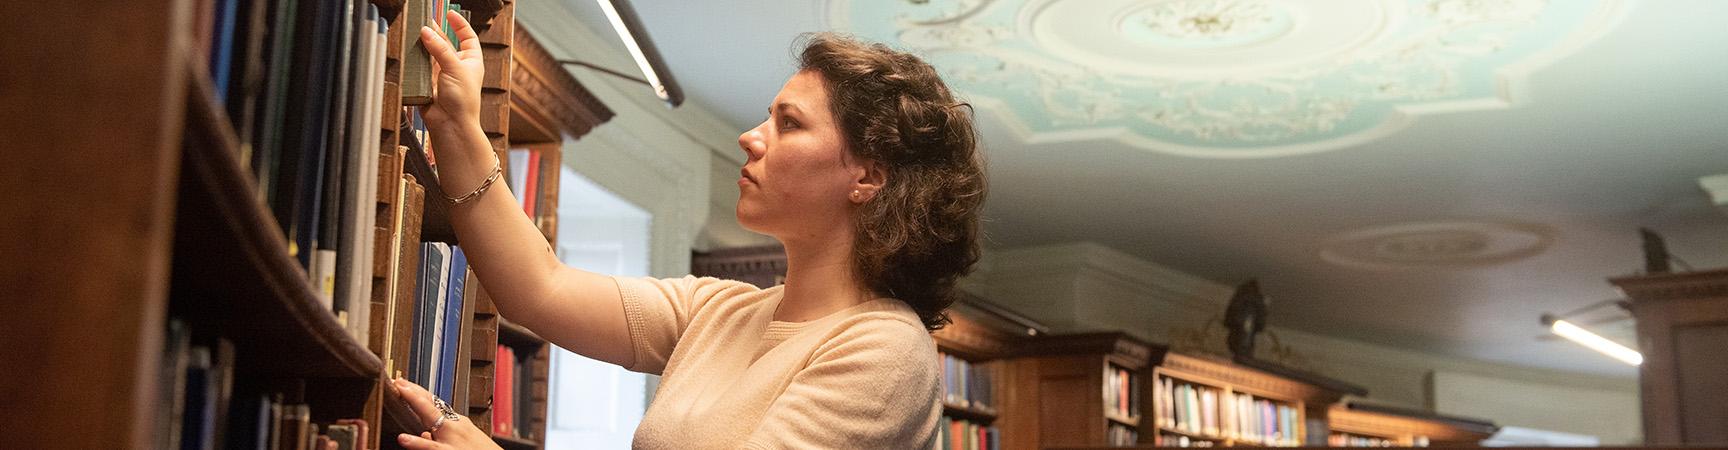 A student pulls a book off a bookshelf